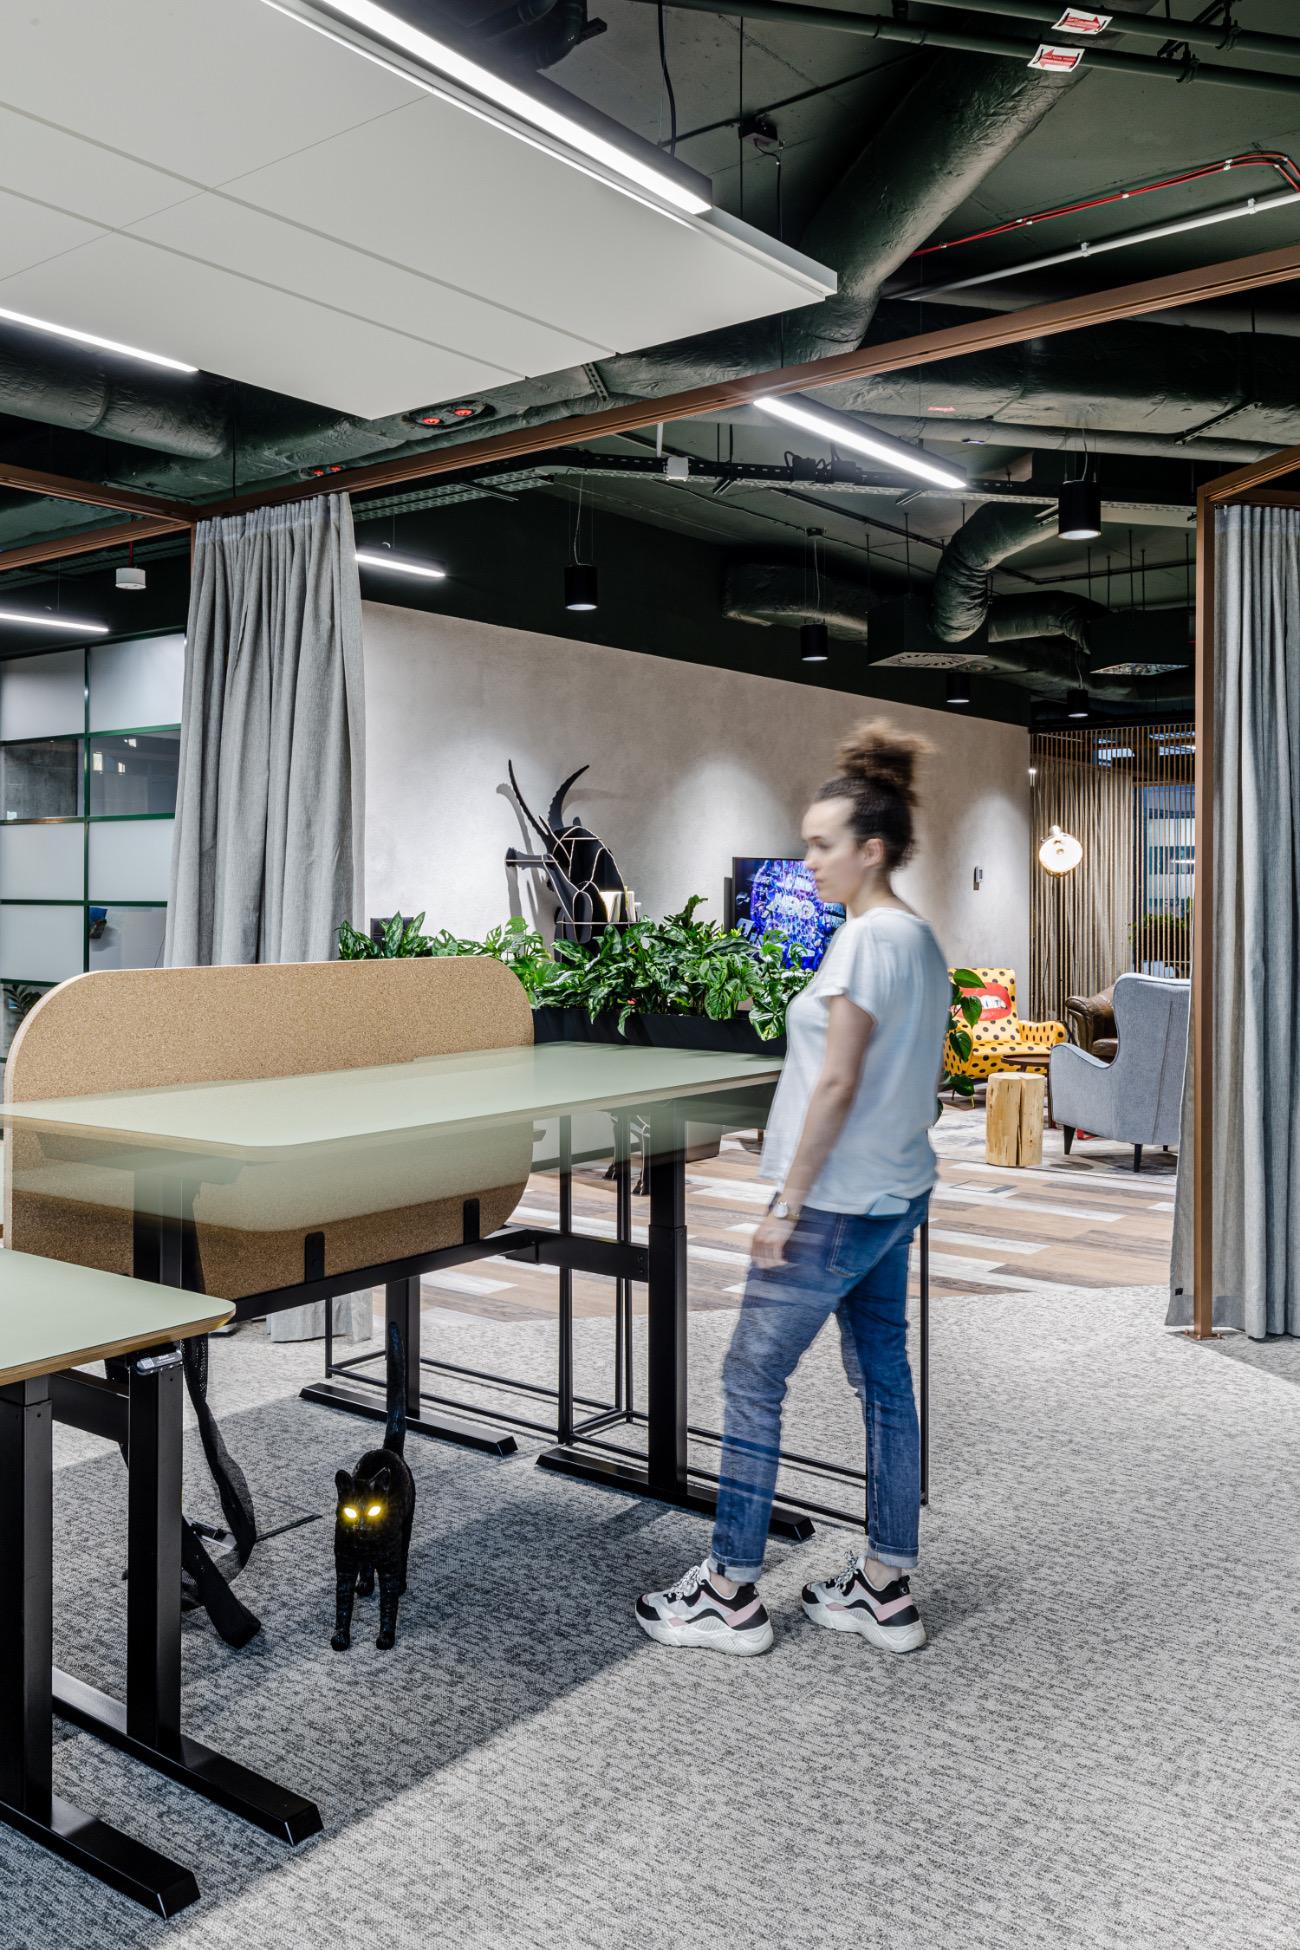 syzygy-warsaw-office-11